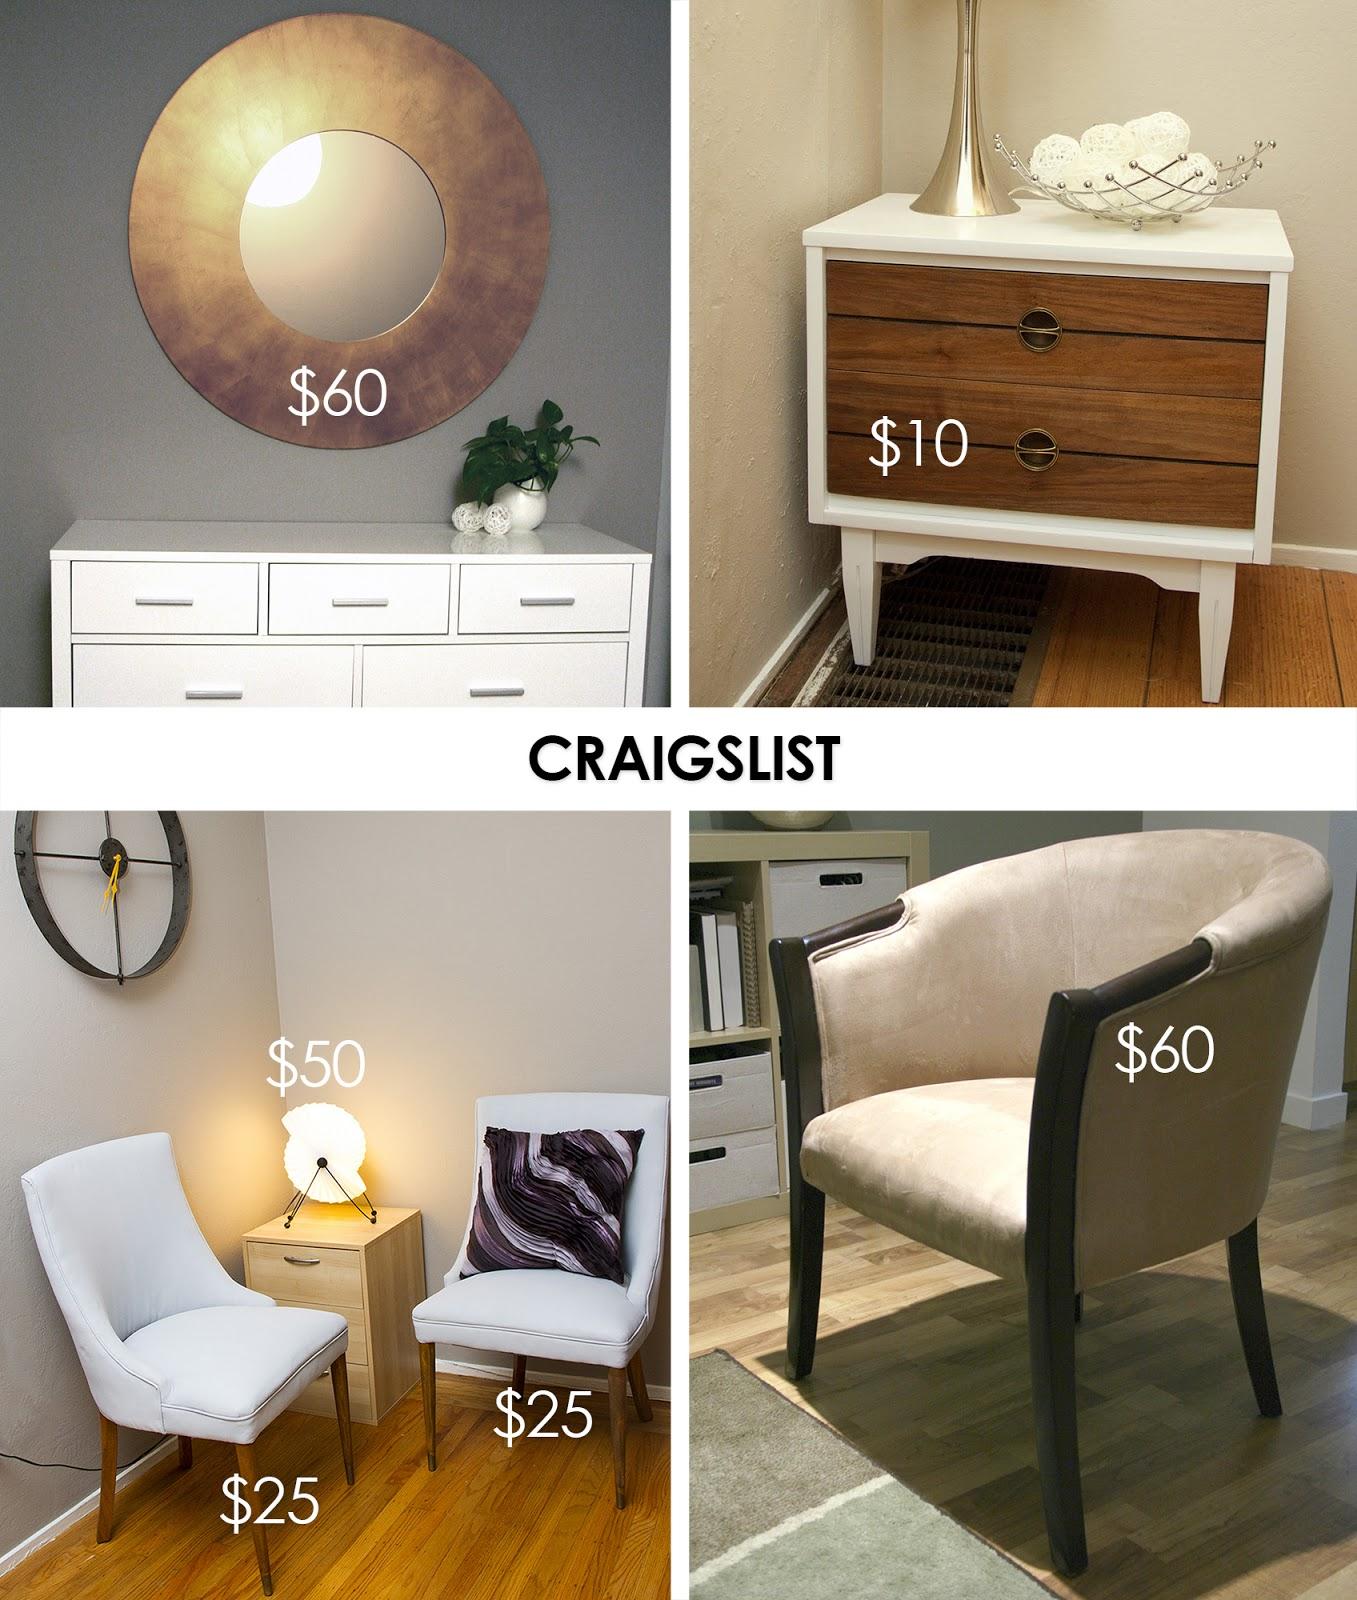 Surprising Swingncocoa How To Win At Craiglist Spiritservingveterans Wood Chair Design Ideas Spiritservingveteransorg